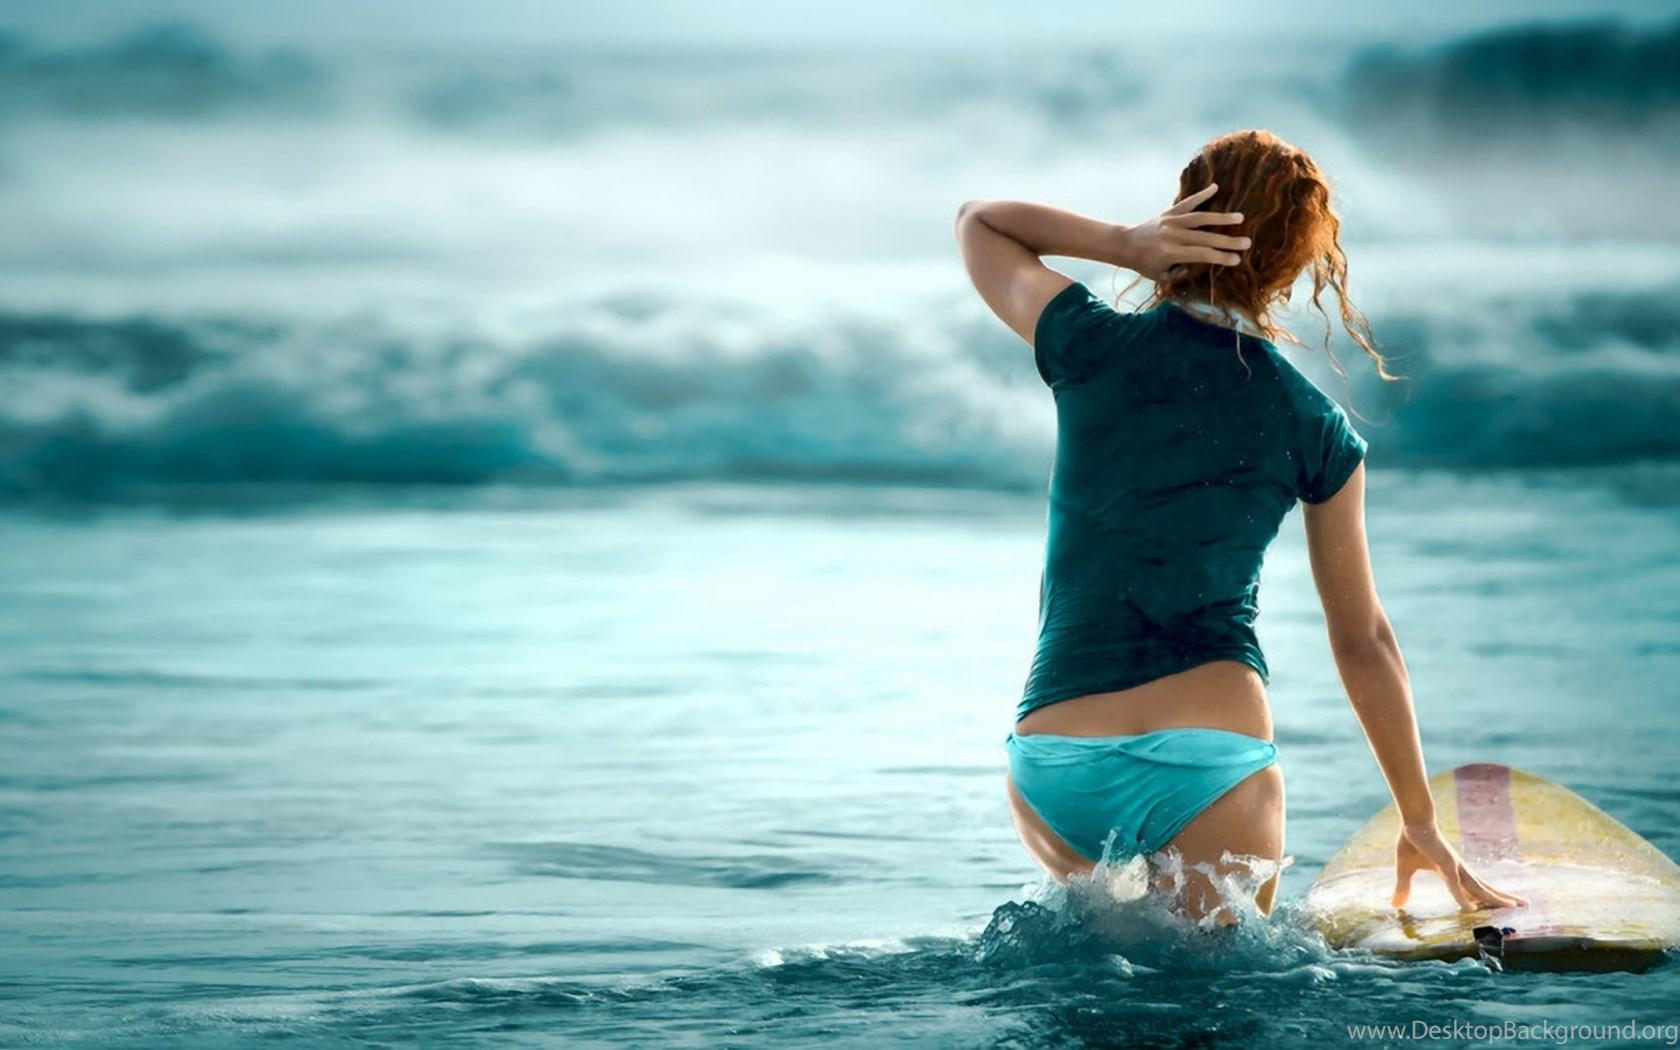 Bikini Girl Beach Surfing Green Shirt Blue Wave Hd Wallpapers